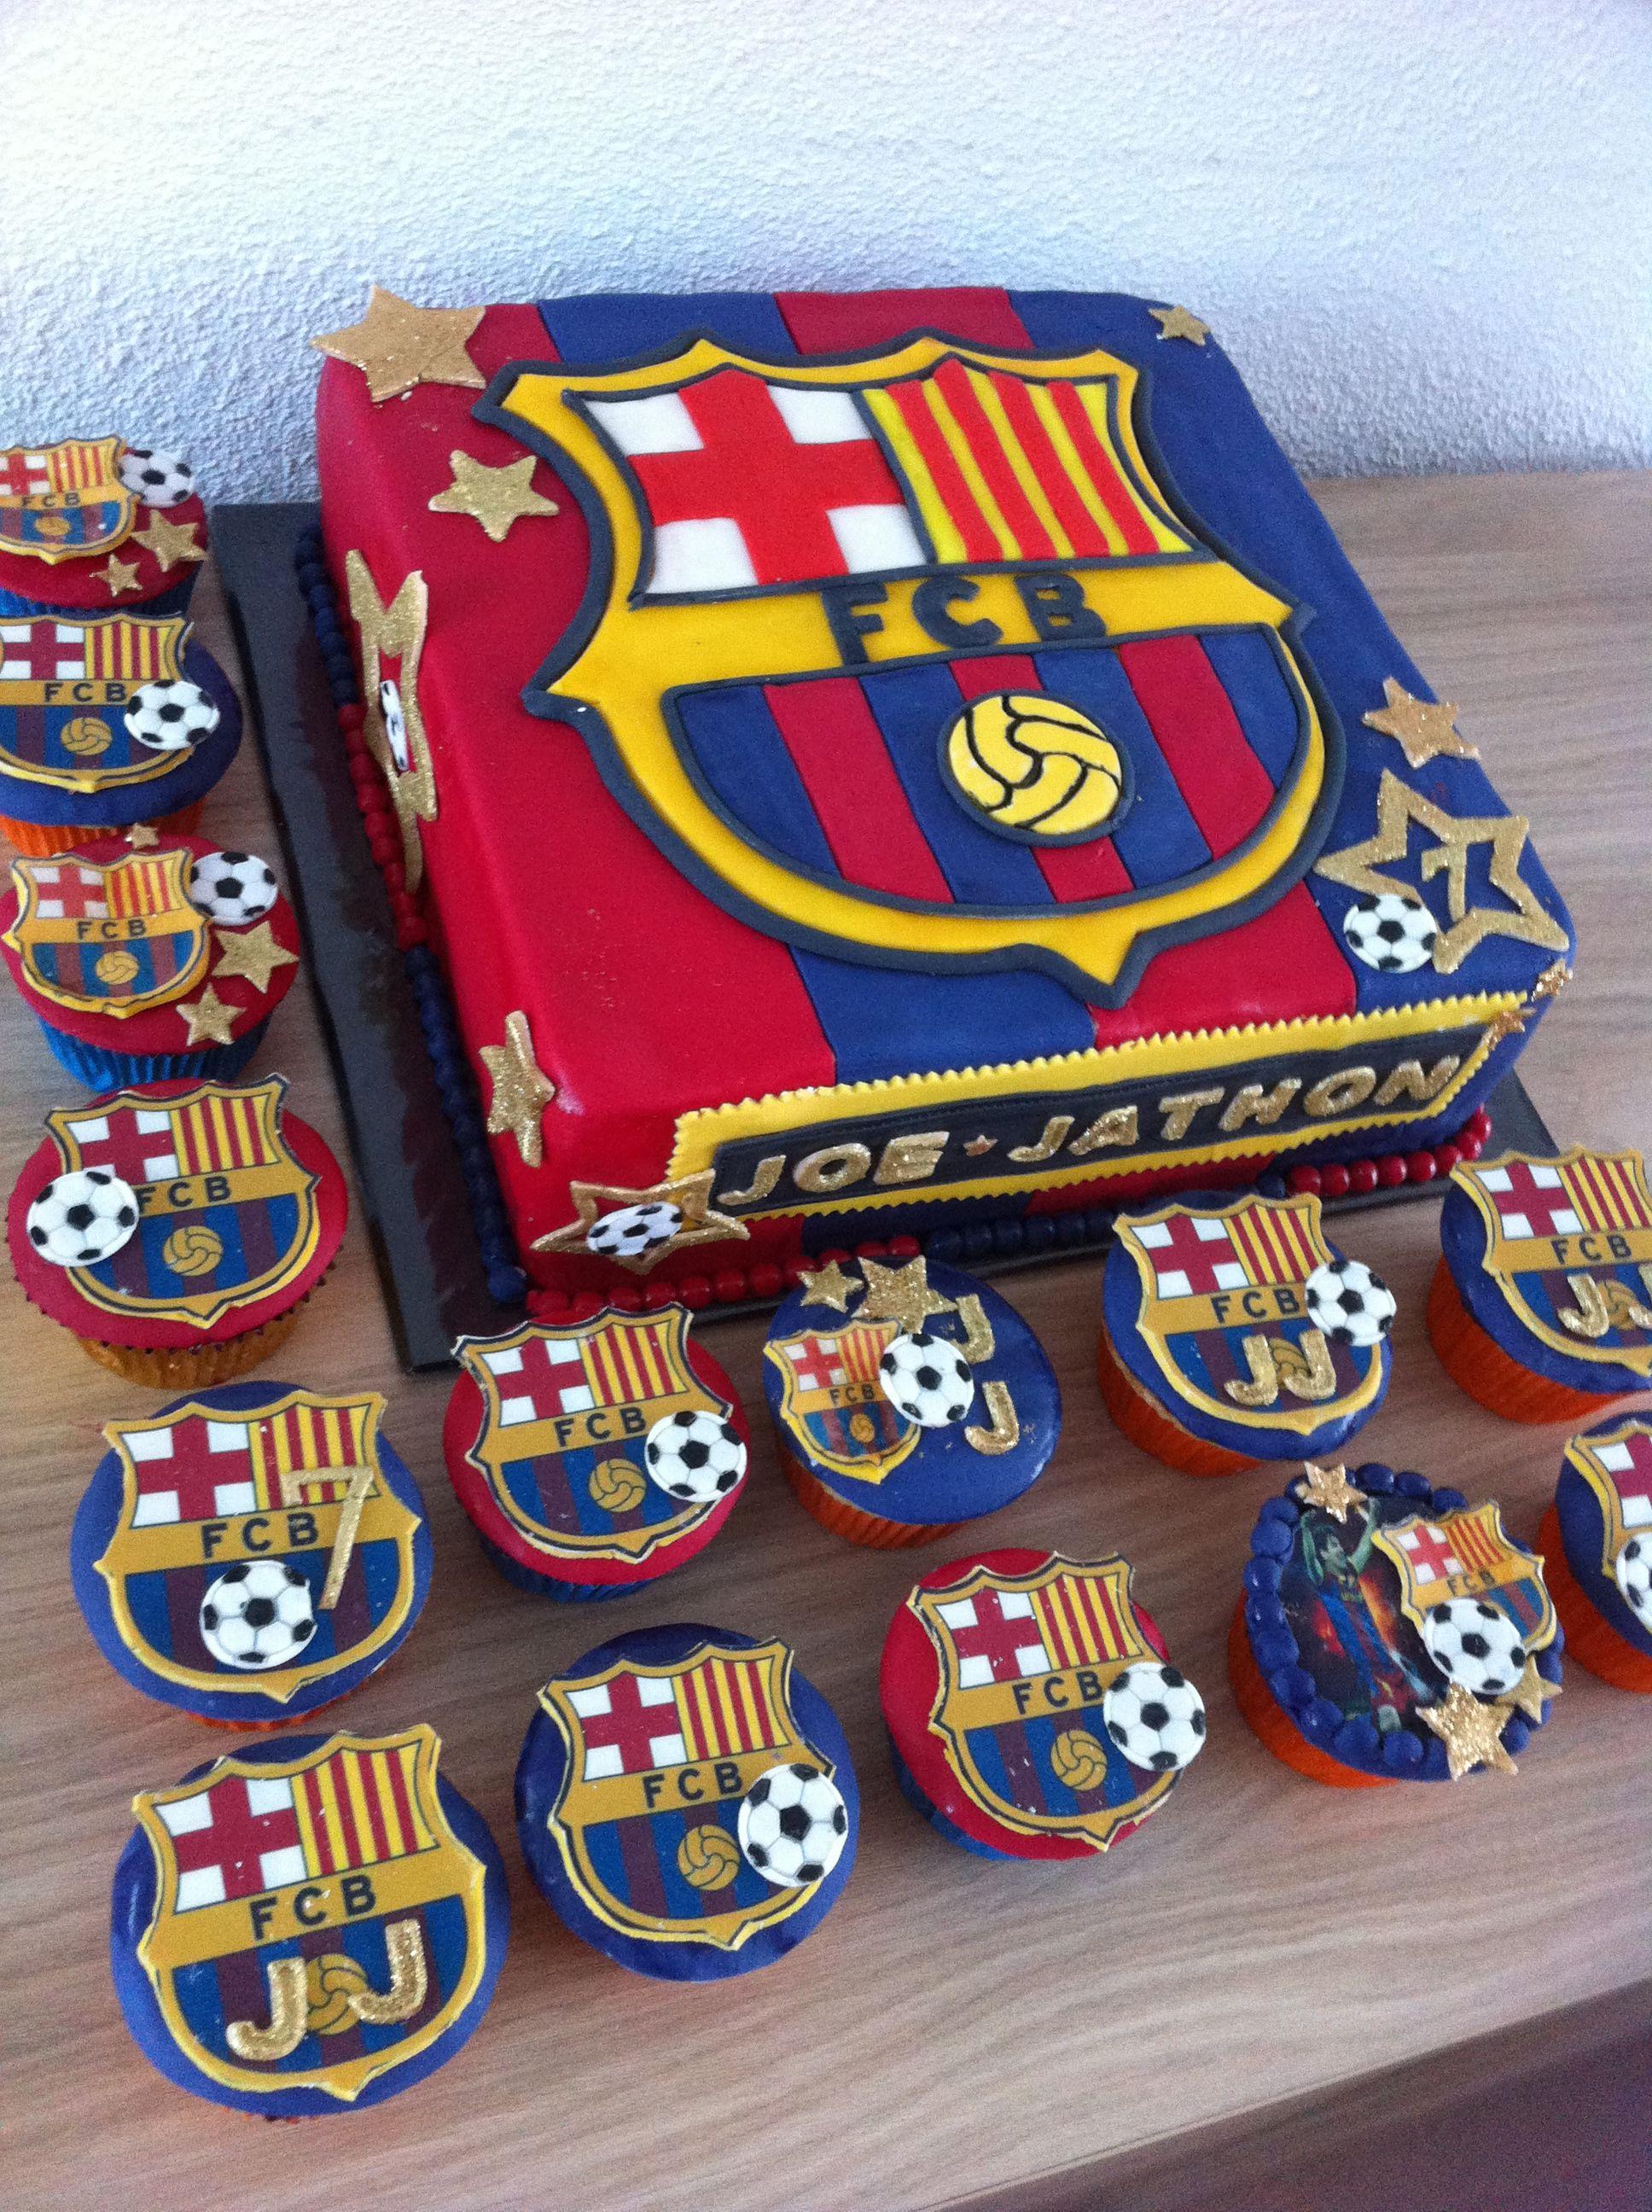 FC Barcelona cake Más 774b01ad074